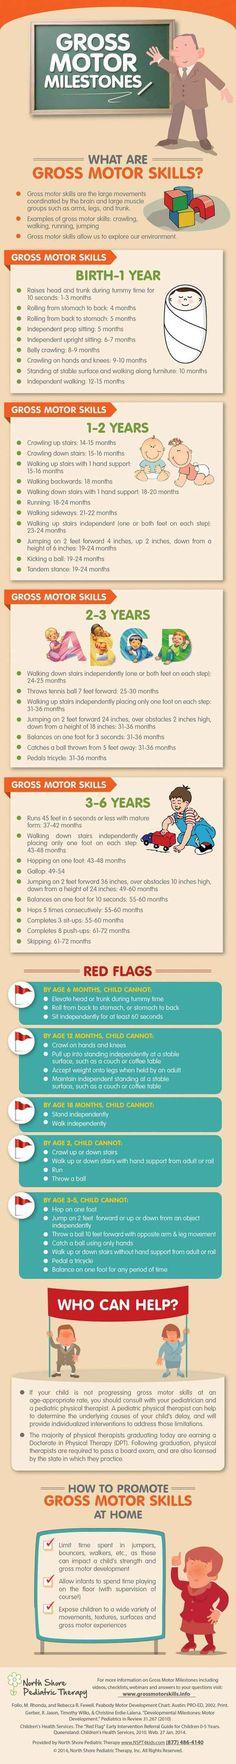 Understand gross motor skills and your child's development: